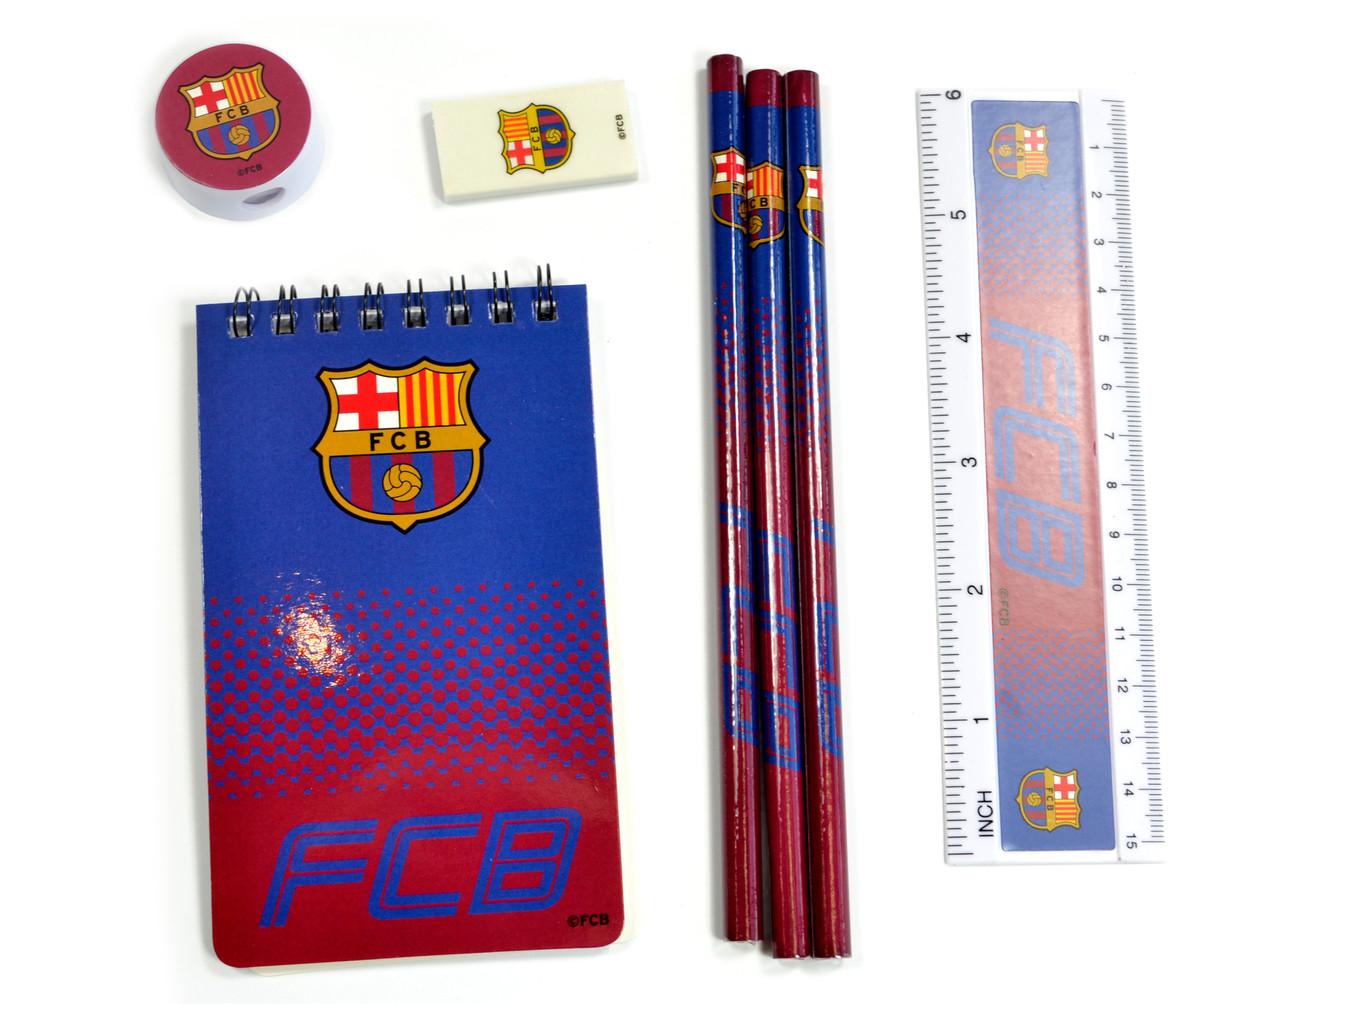 Barca stationery kit